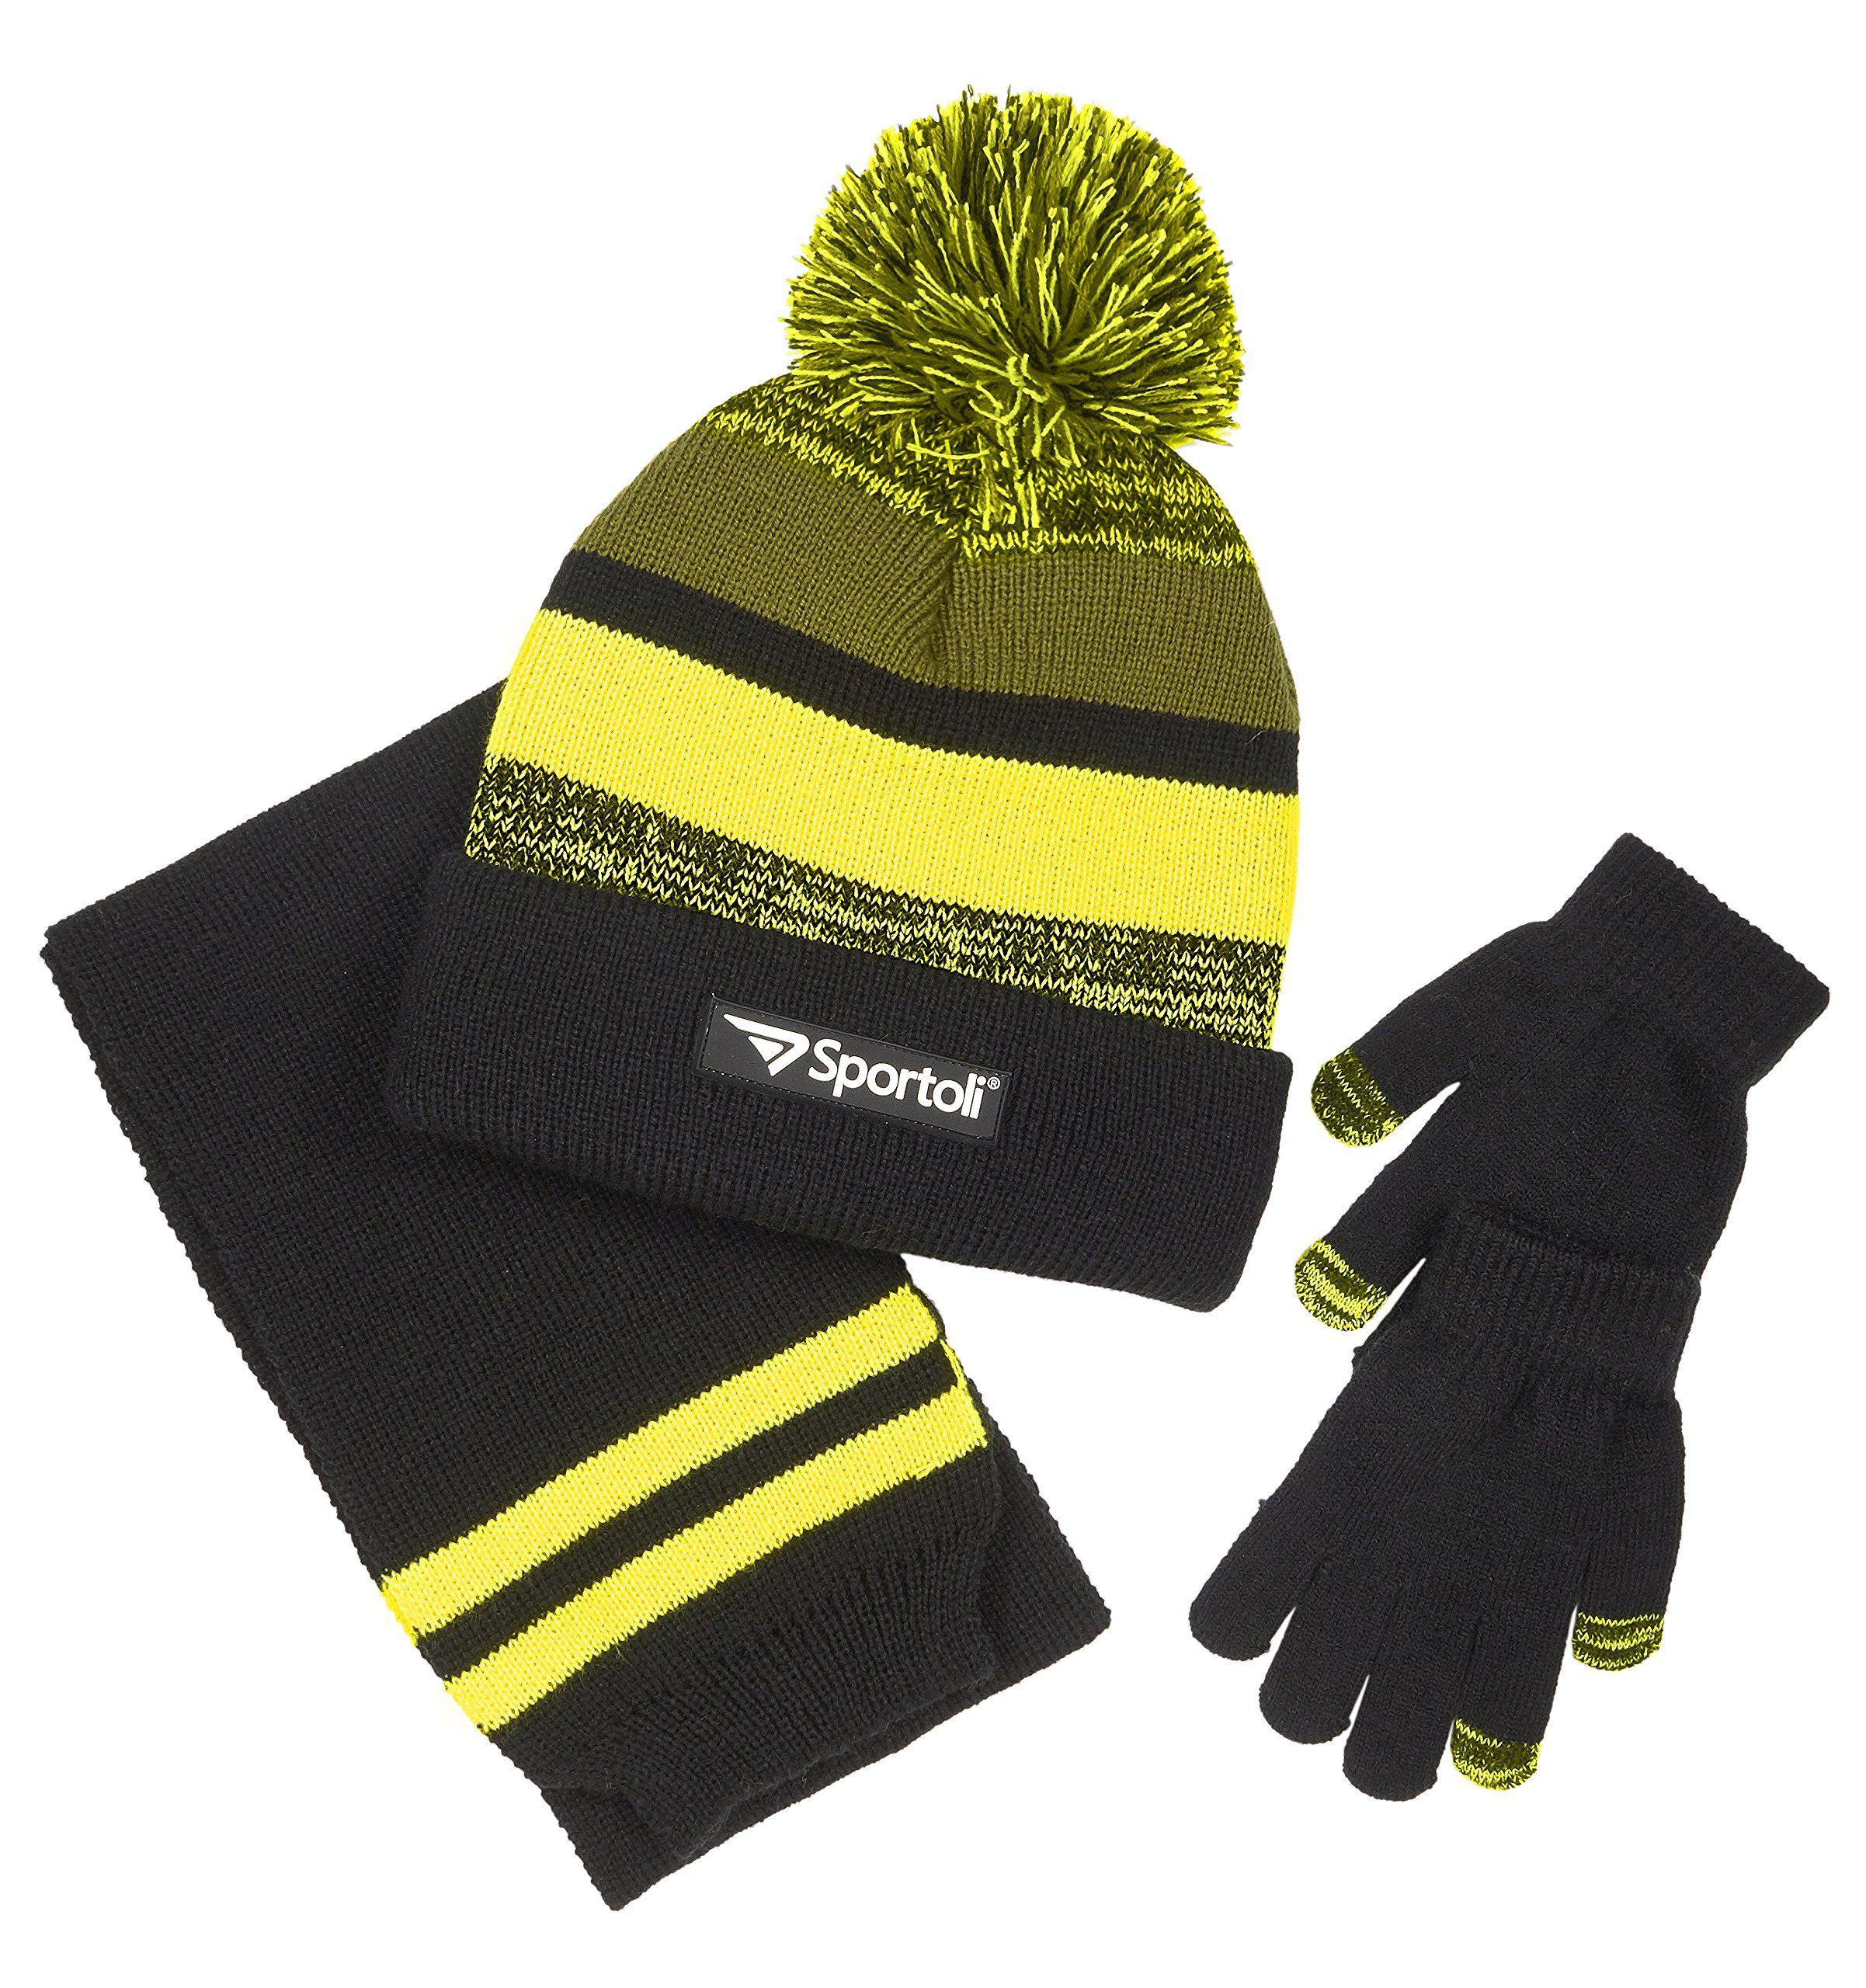 04d190ff808 Sportoli Boys  Kids Knit Cold Weather Accessory Set Warm Hat